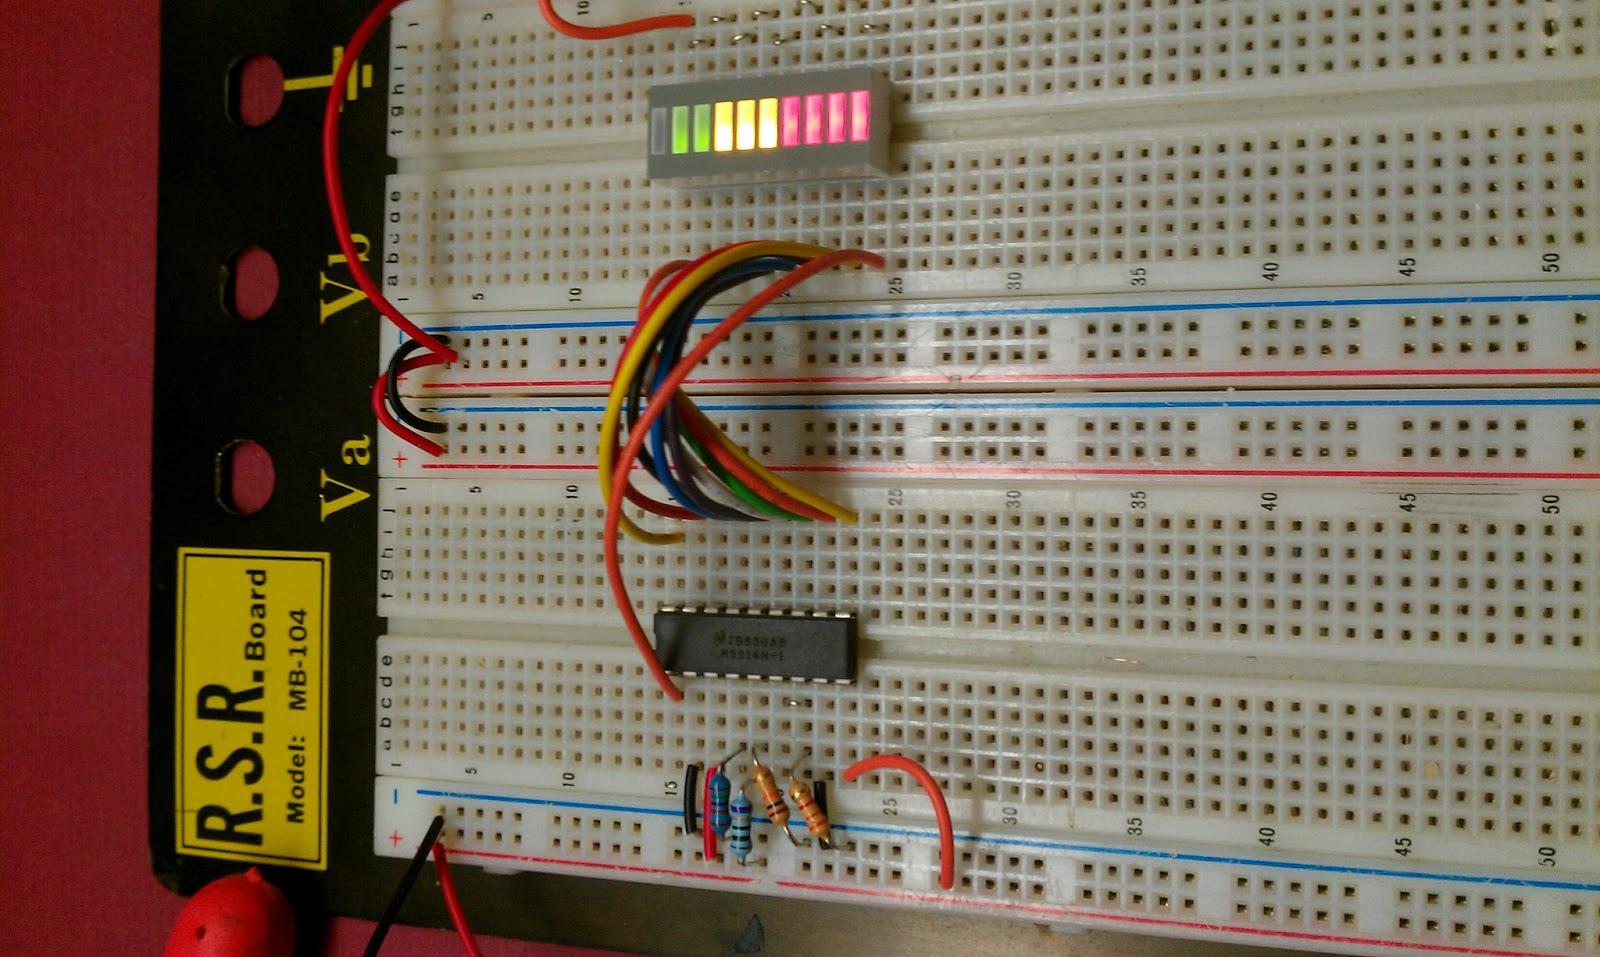 N1ir Electronics Website February 2013 5v O2 Sensor Circuit Using Lm3914 Led Display For Car Airfuel Mixture Dot Mode